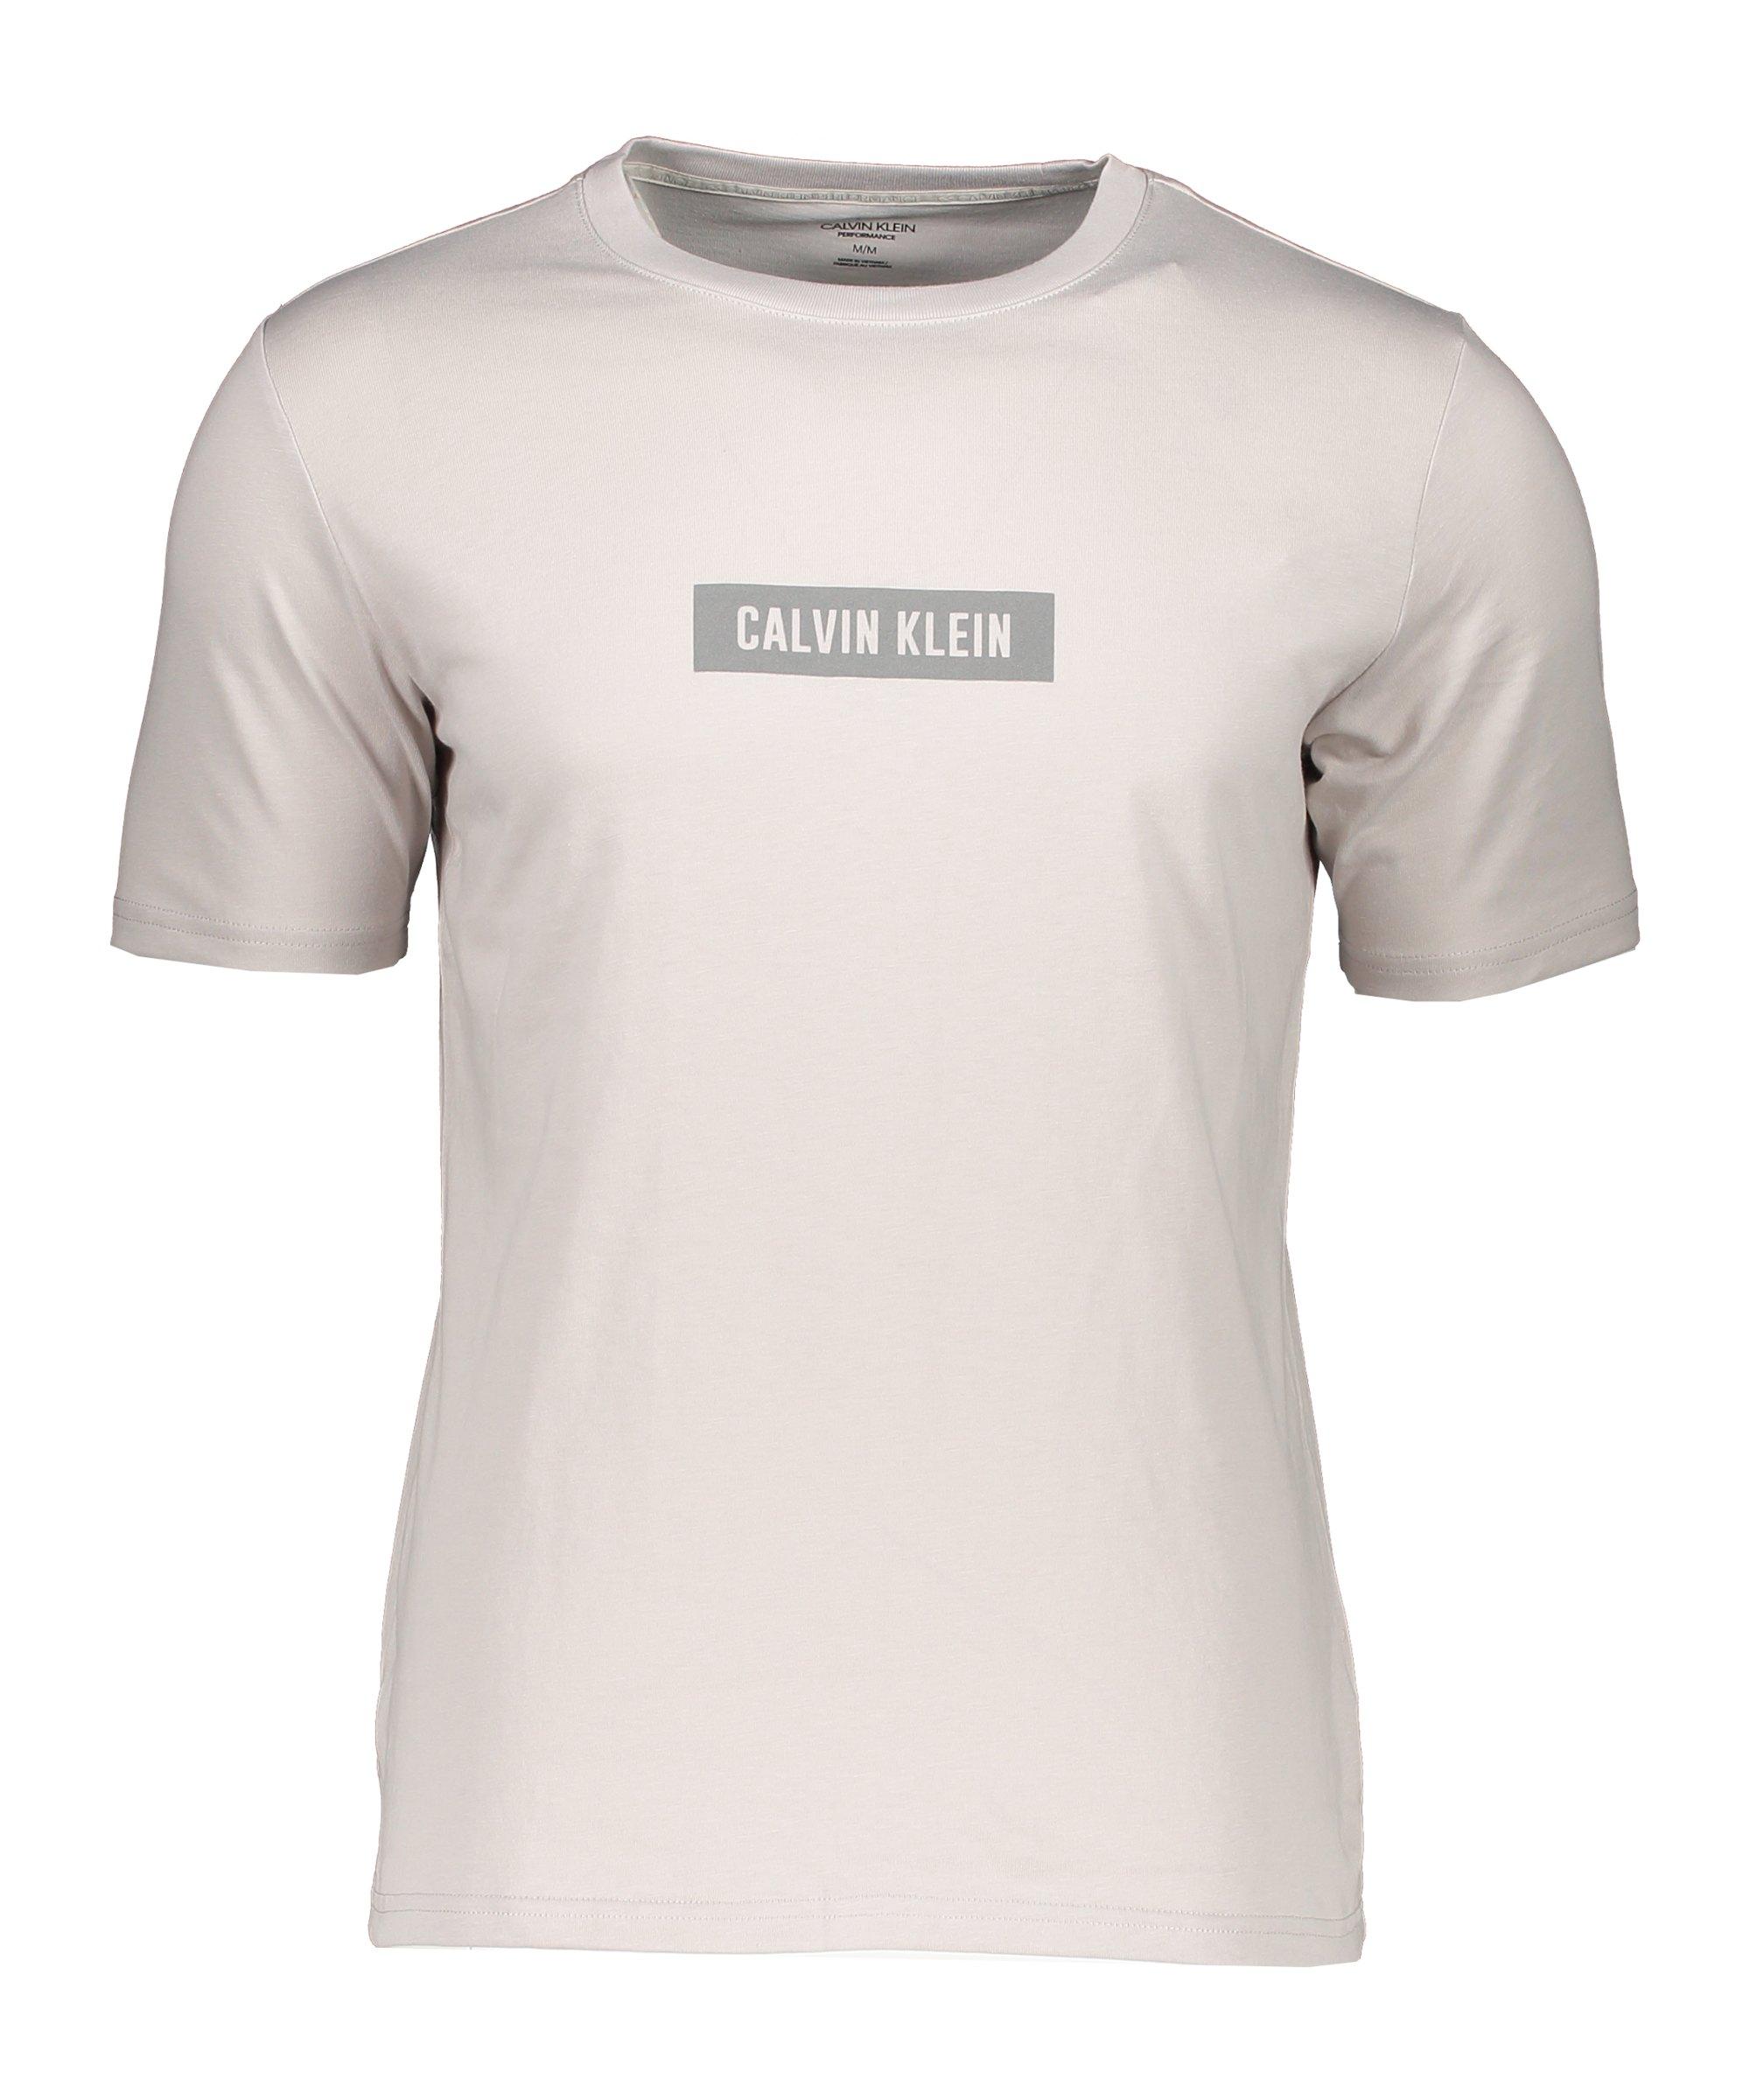 Calvin Klein T-Shirt Beige Grau F082 - beige